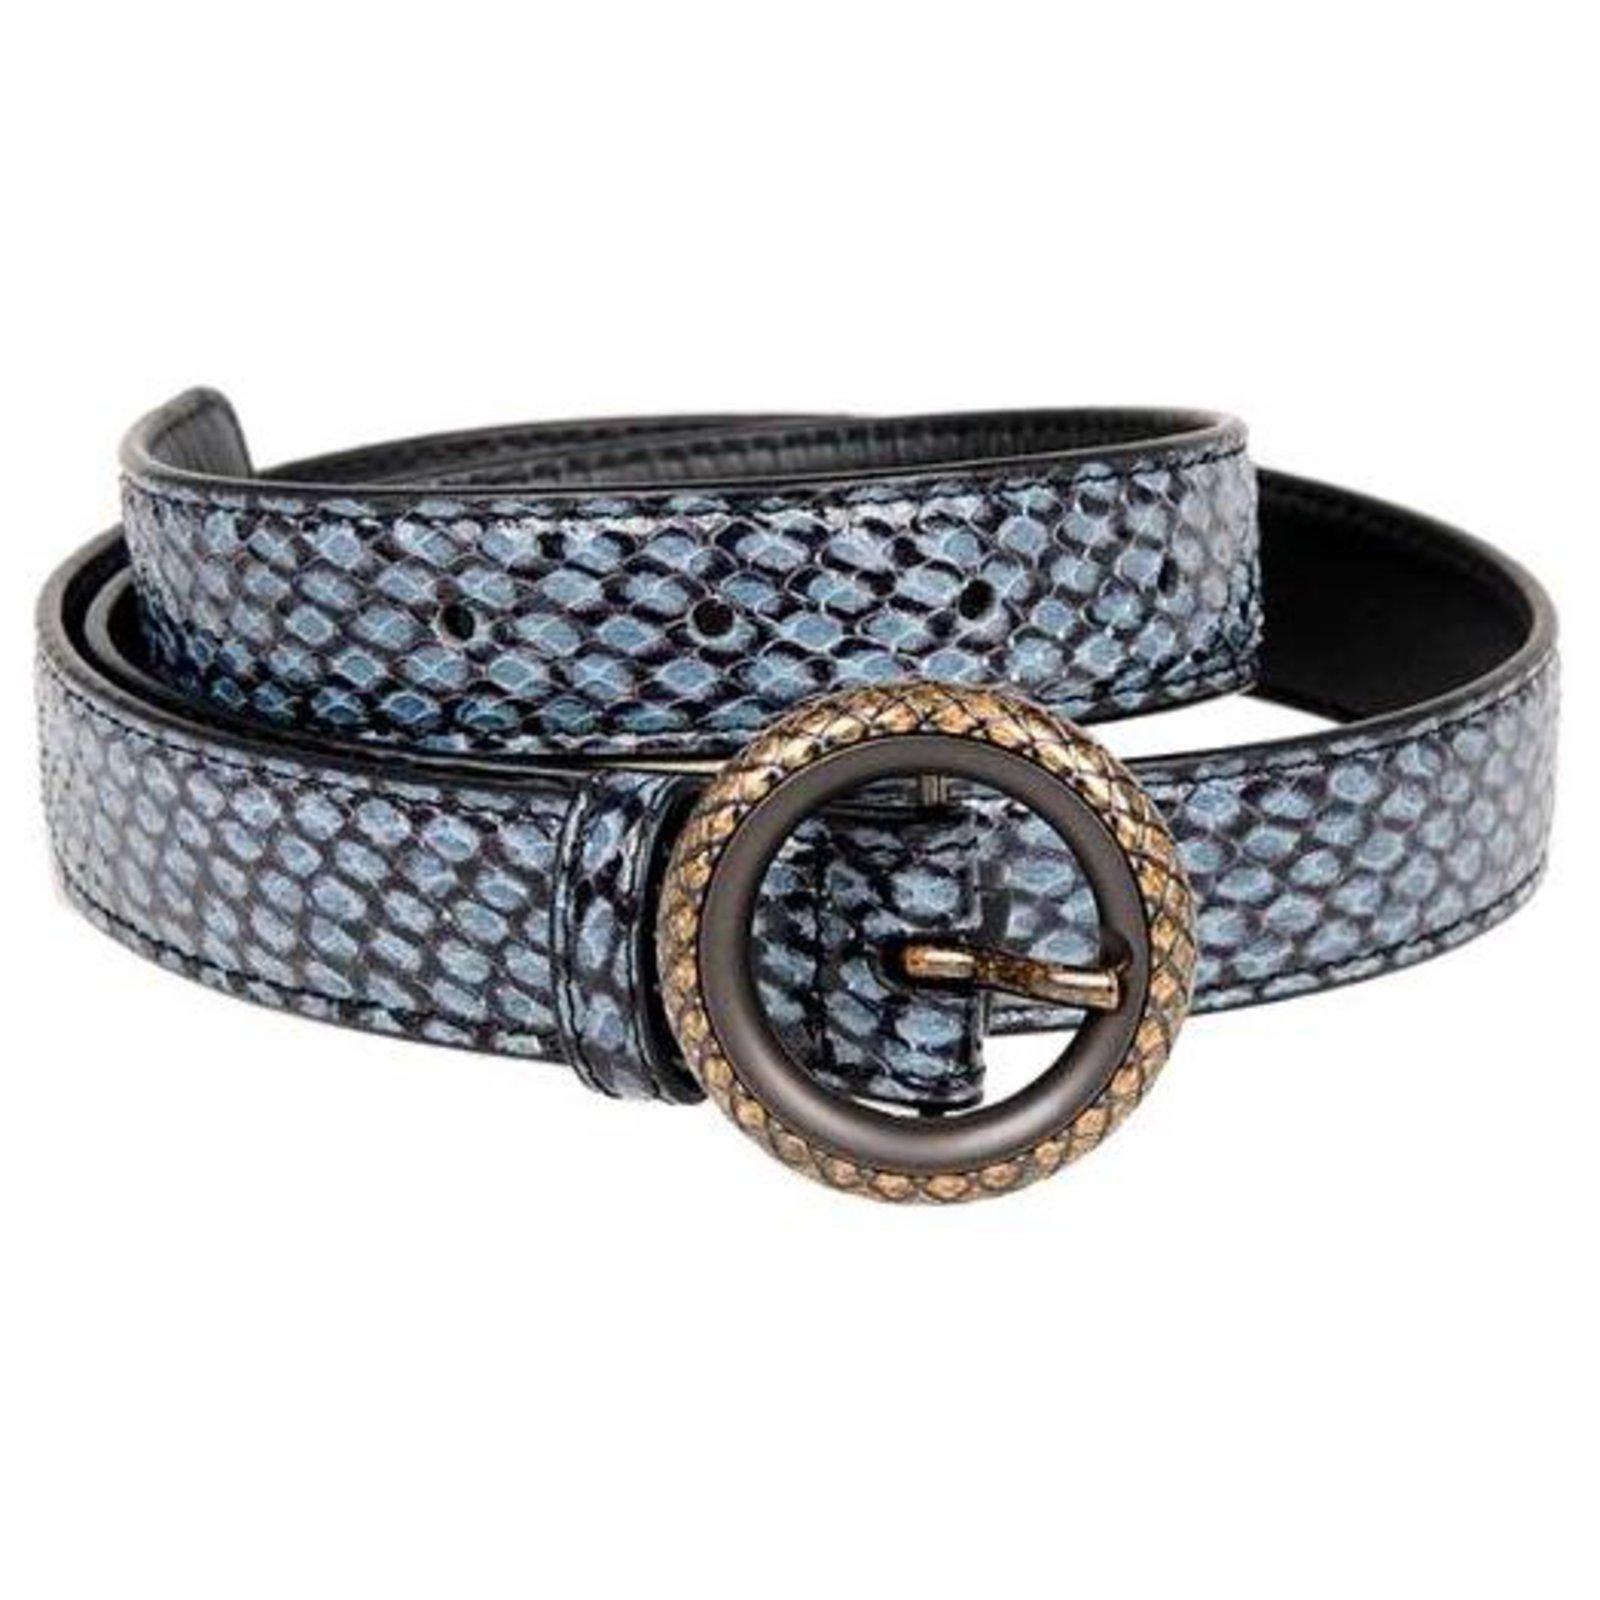 Bottega Veneta Women's belt Belts Leatherette Blue ref.131667 - Joli Closet